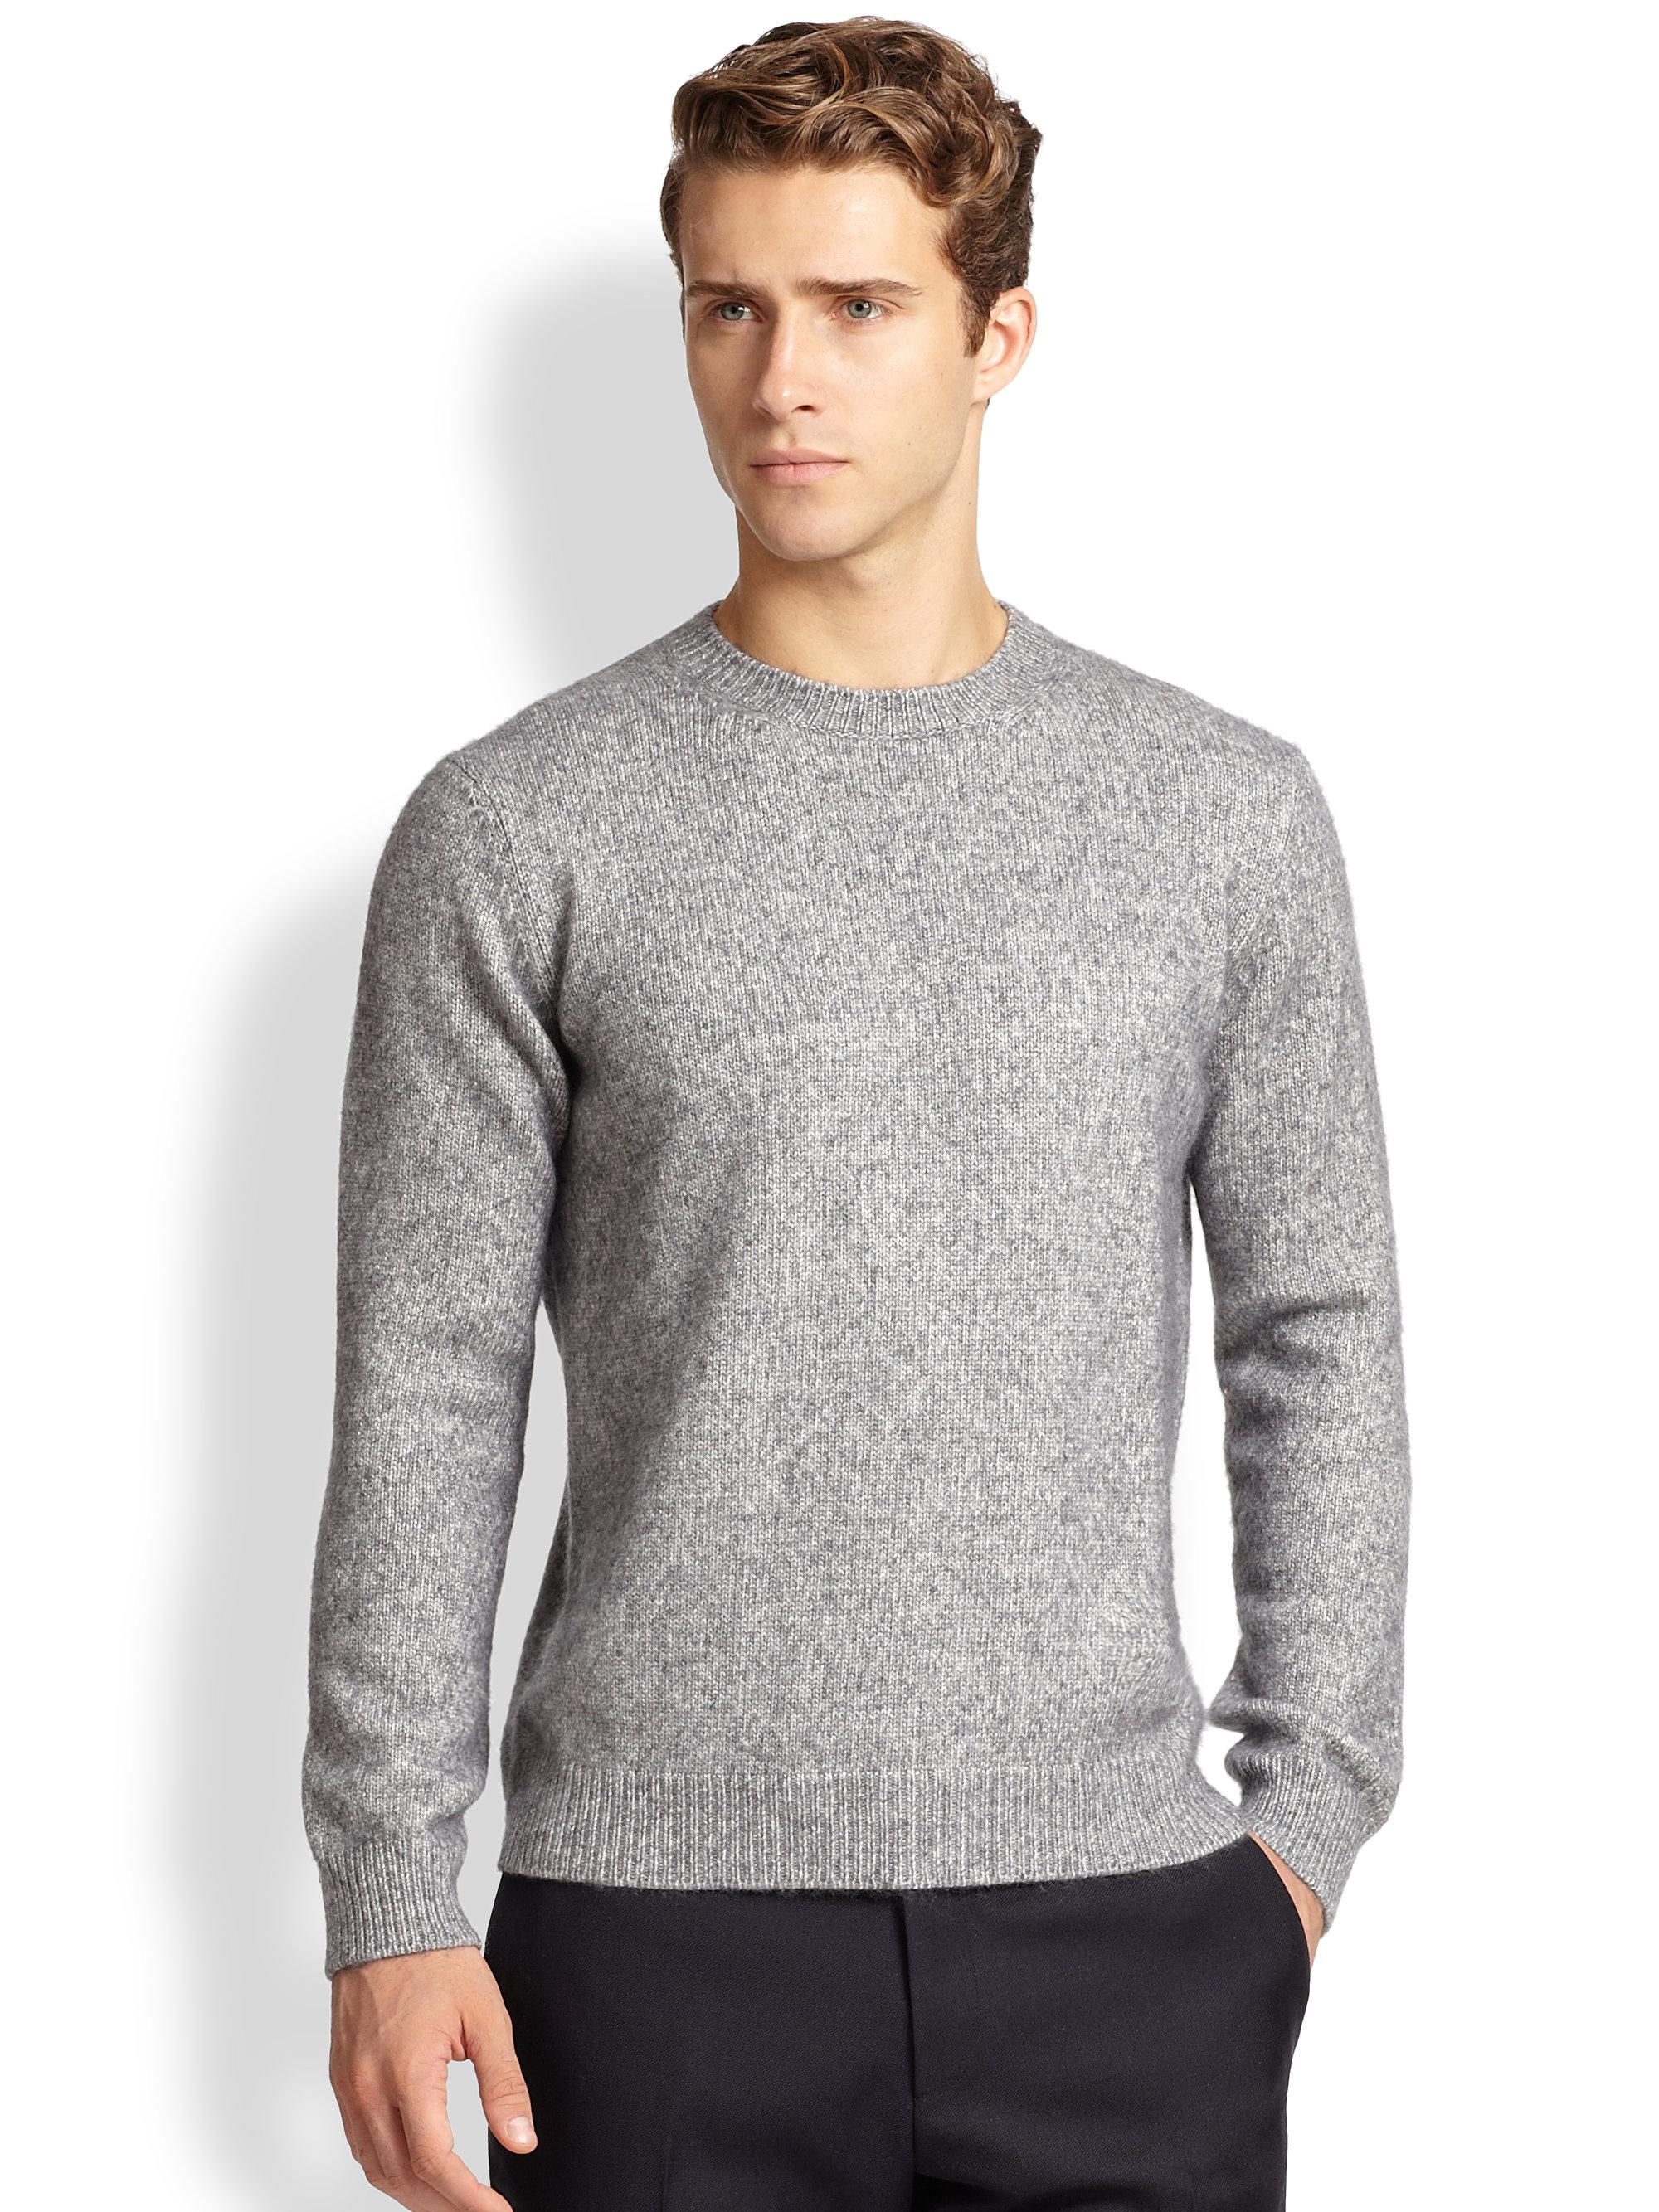 Wool Sweater Grey: Ferragamo Crewneck Wool Sweater In Gray For Men